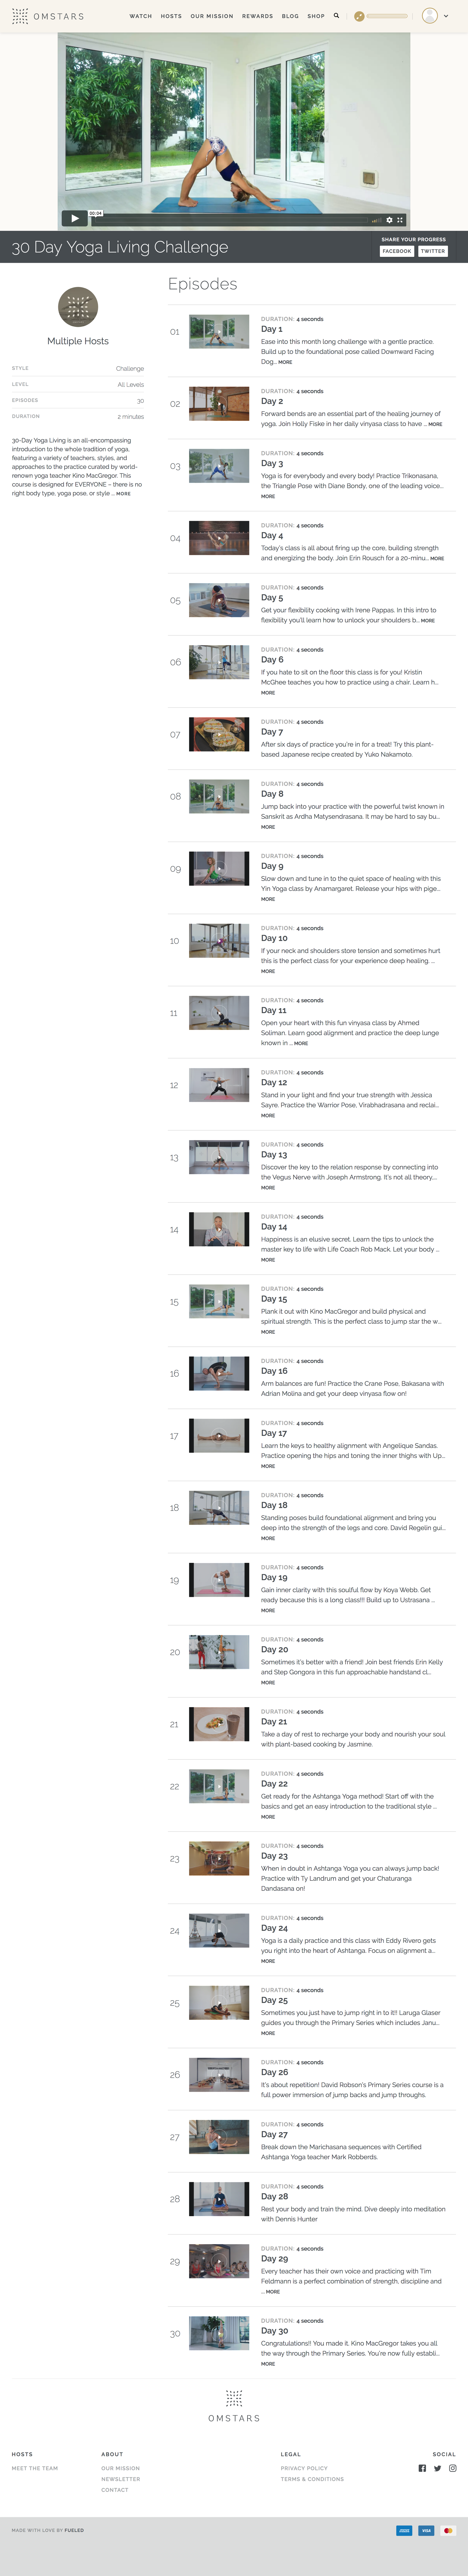 Screenshot of 30 Day Yoga Living Challenge